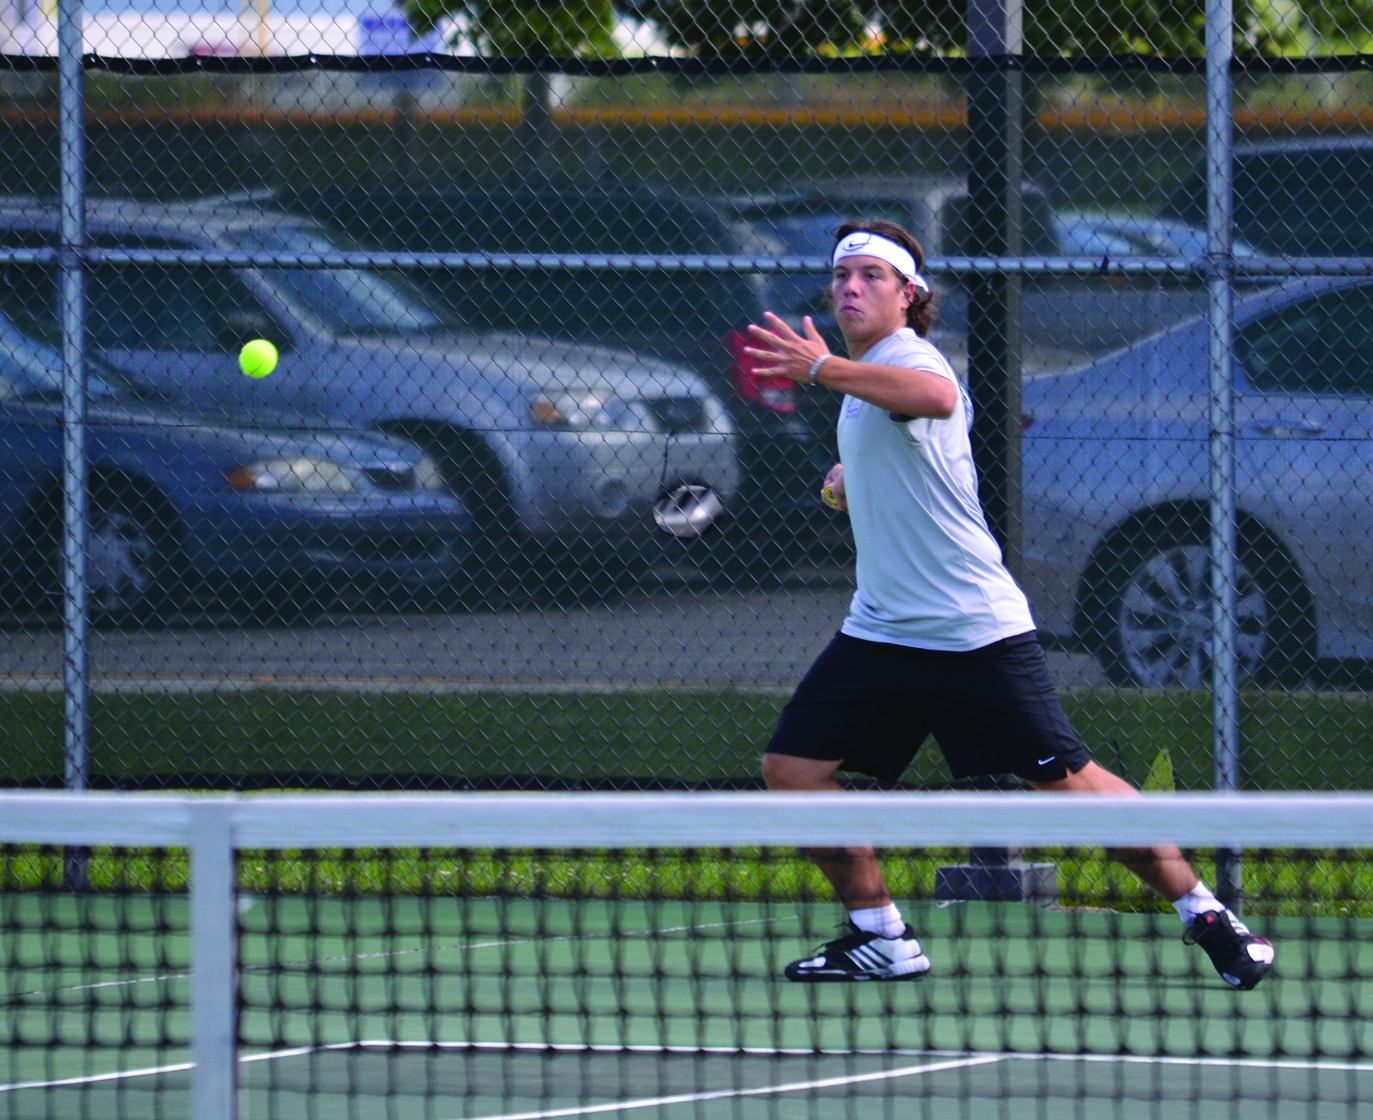 Balazs Piroit prepares to hit the ball during a tennis match